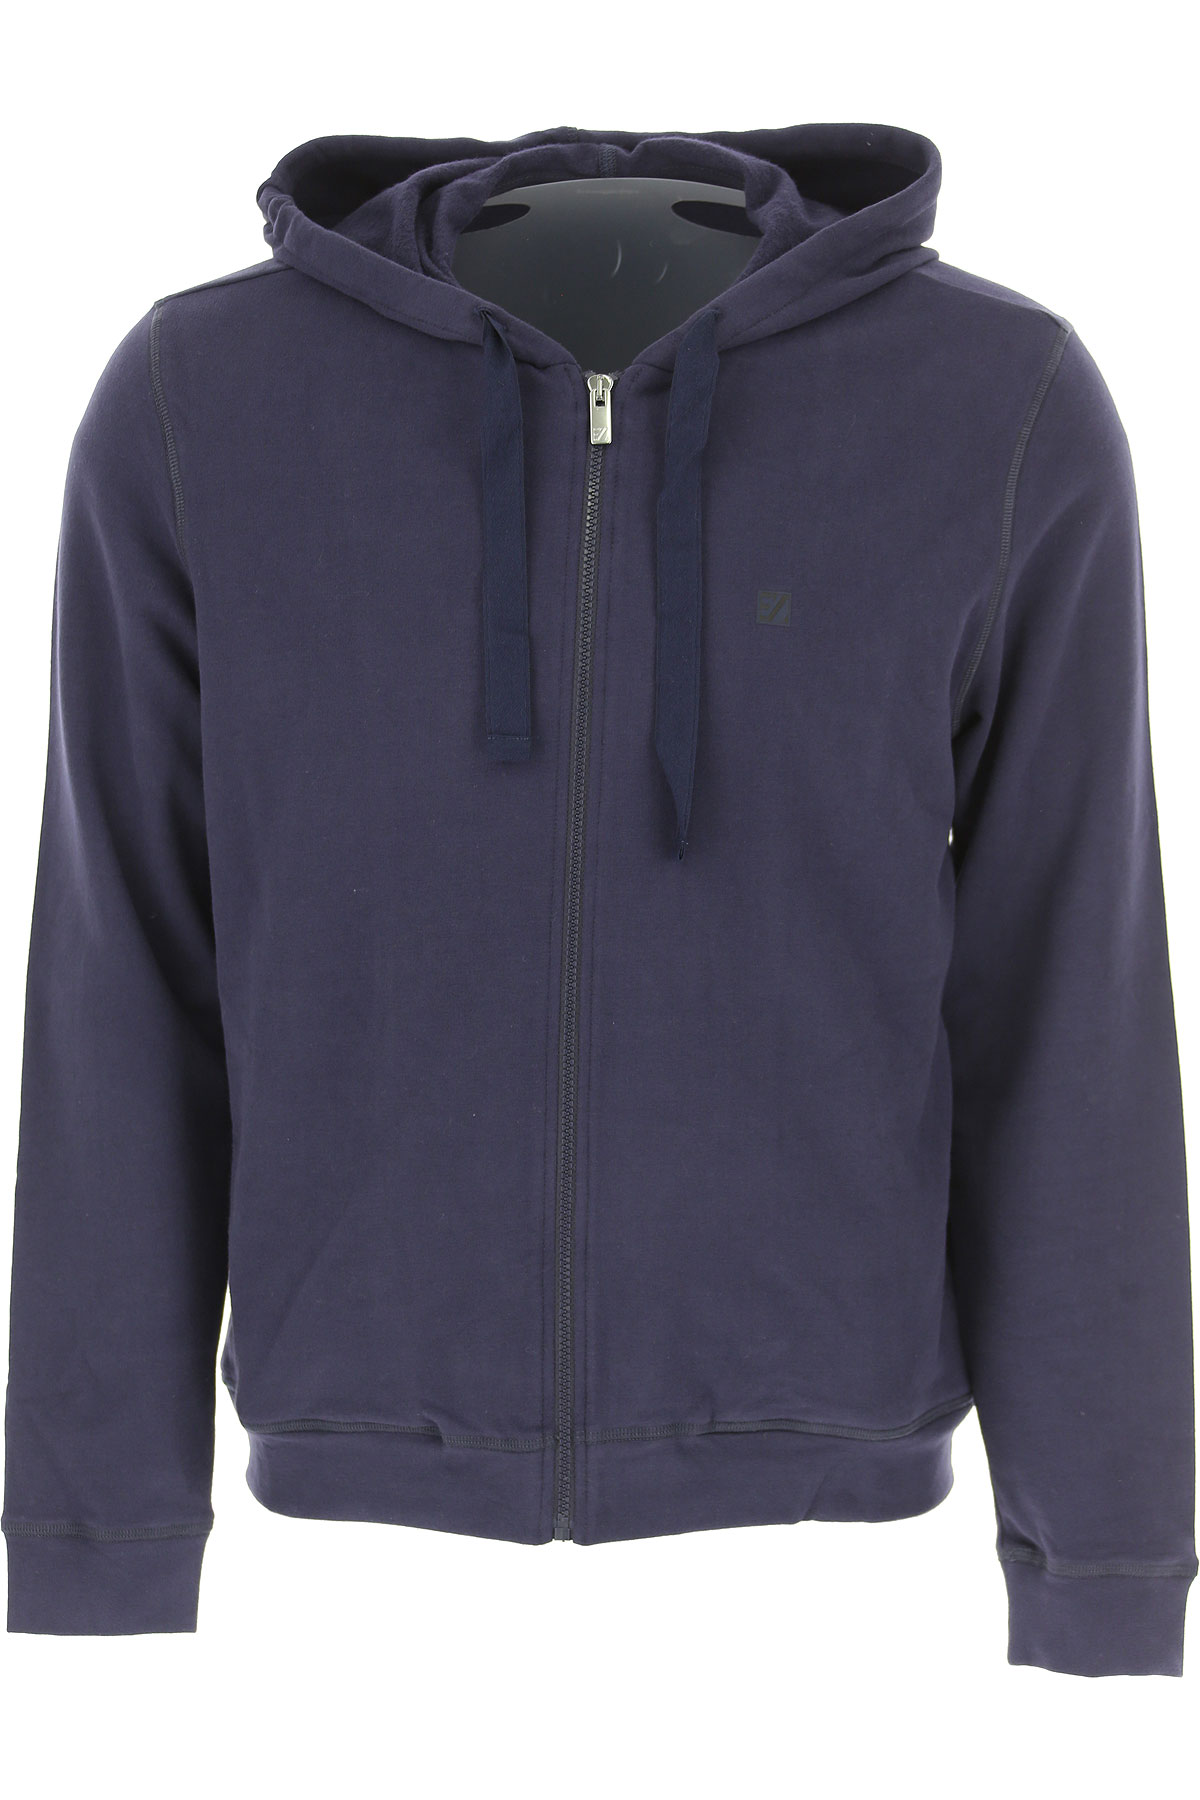 Ermenegildo Zegna Sweatshirt for Men, Blue, Cotton, 2017, L M S XL XXL USA-470922